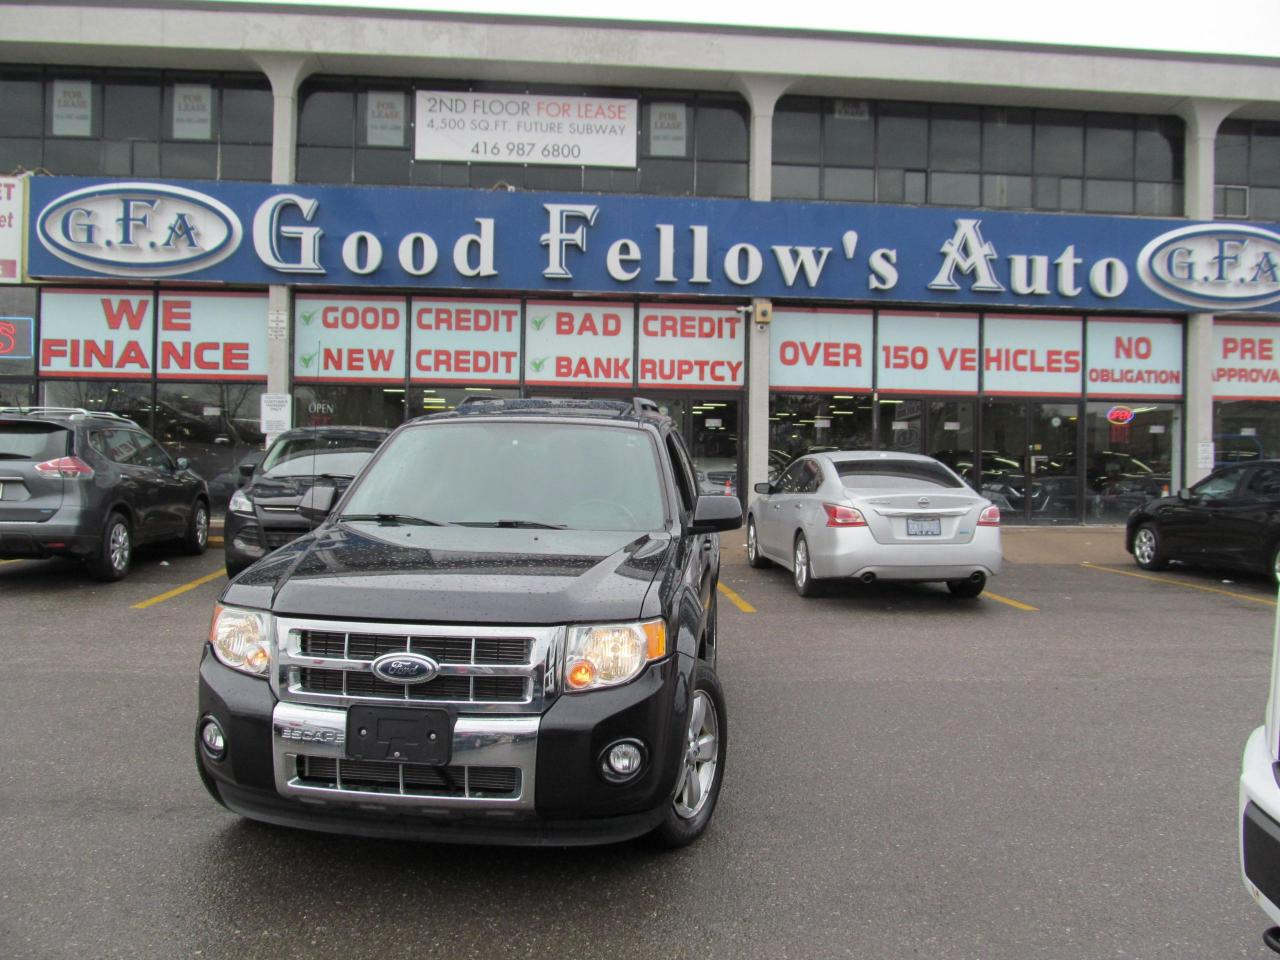 2011 Ford Escape SUNROOF, LEATHER SEATS, HEATED SEATS